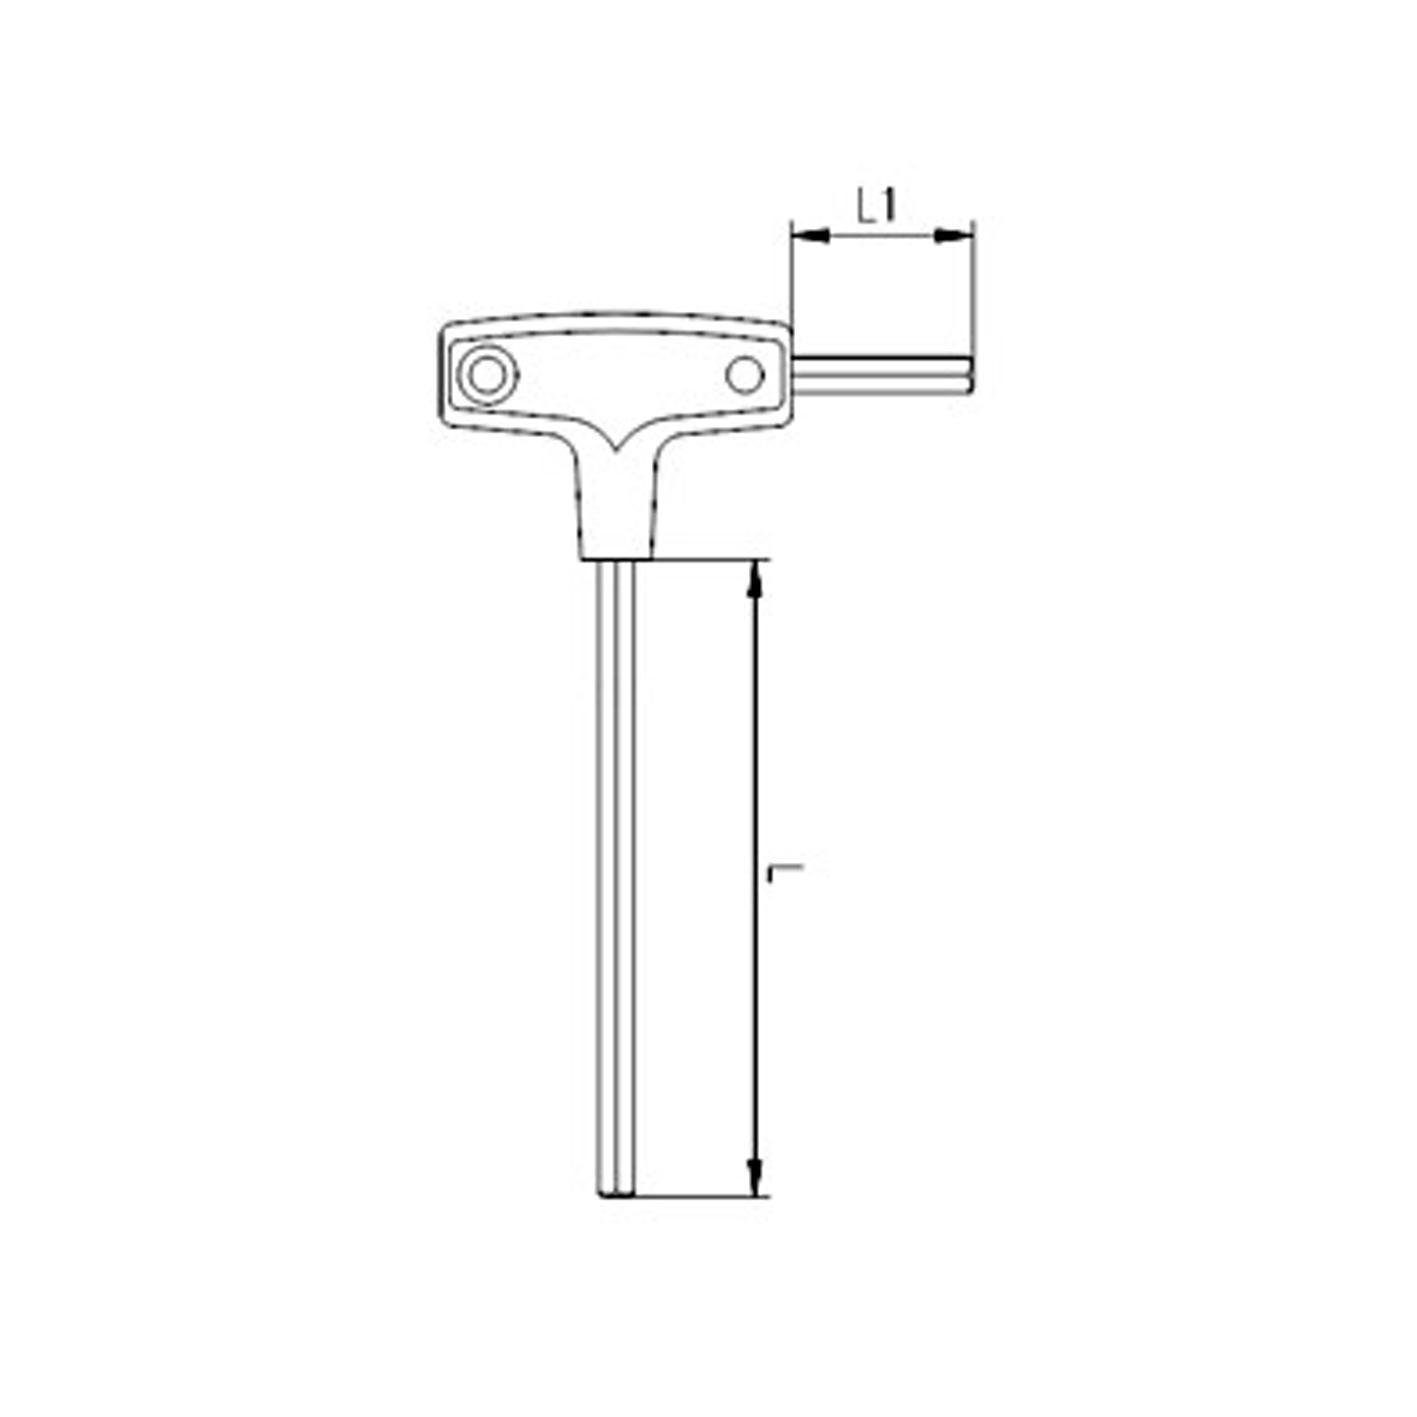 İzeltaş 6mm T Tipi Allen Anahtar